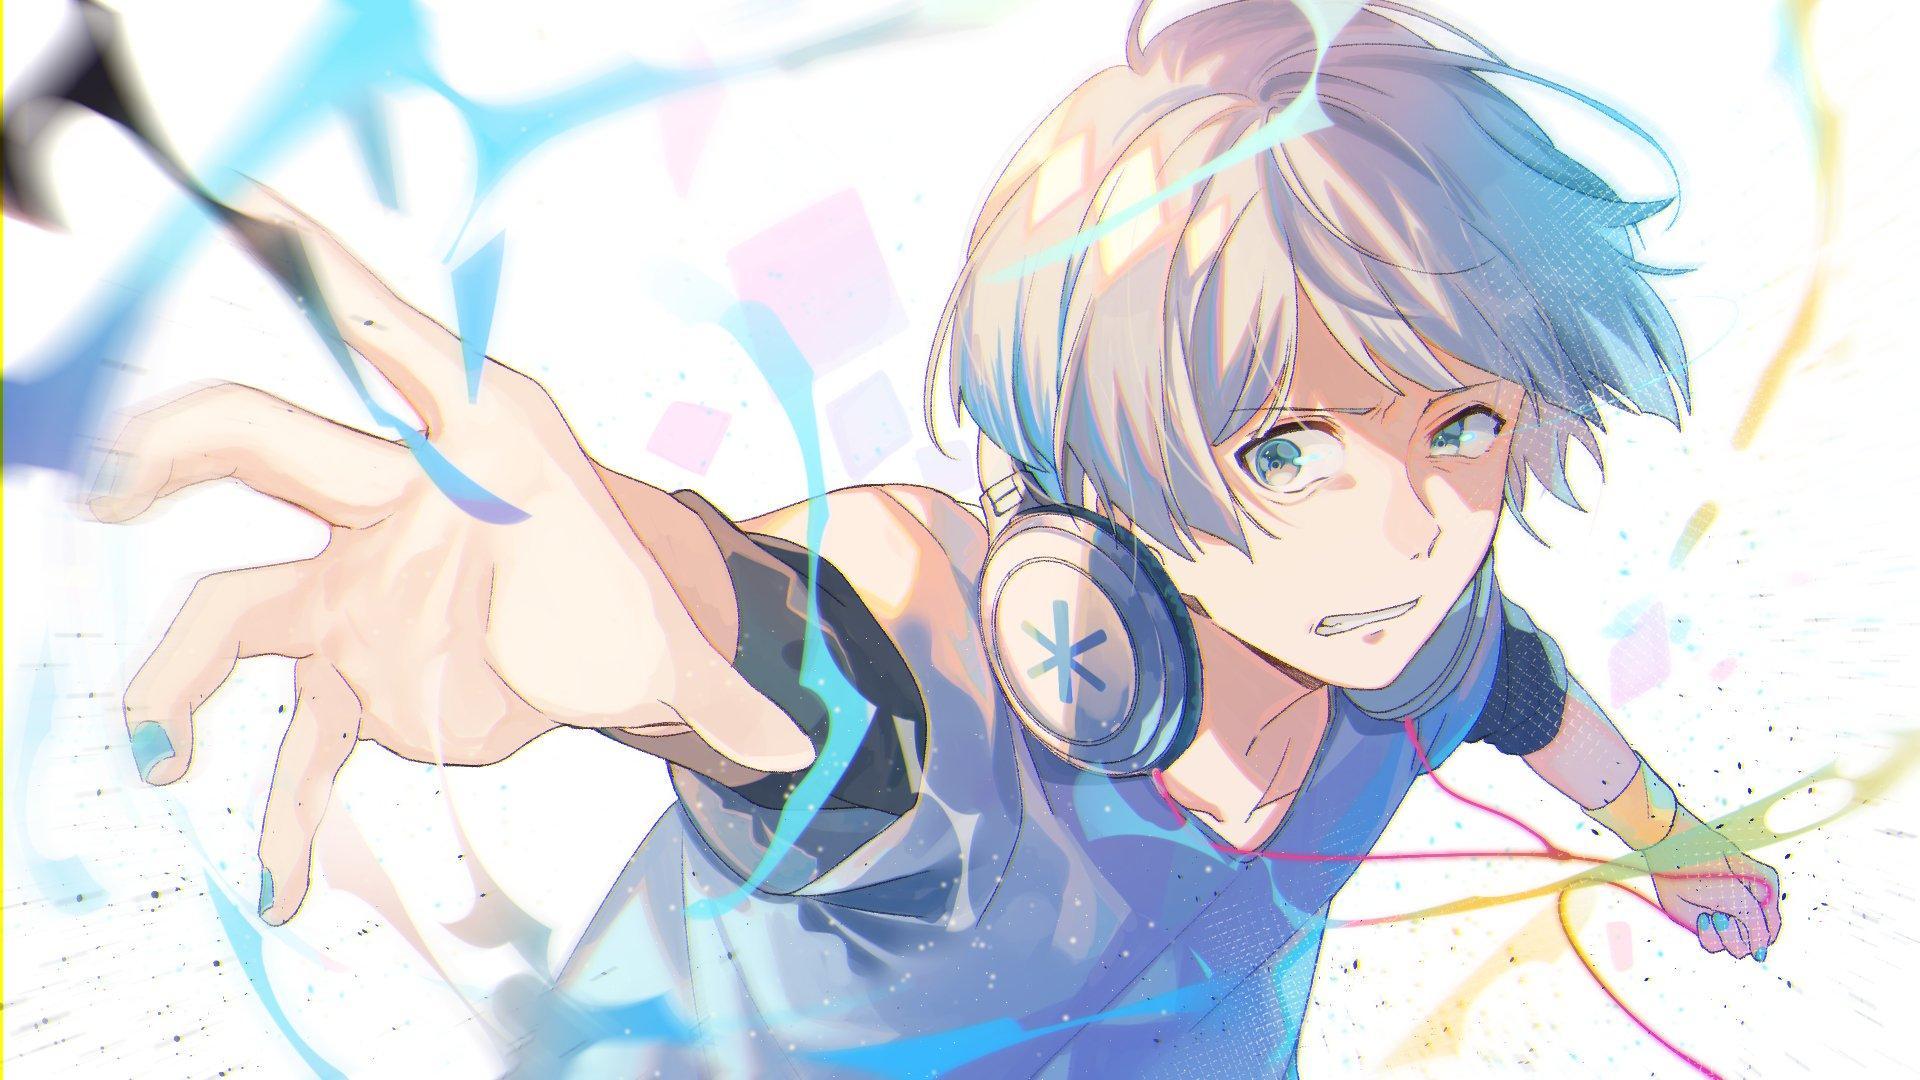 Anime Boys Headphones Wallpapers - Wallpaper Cave